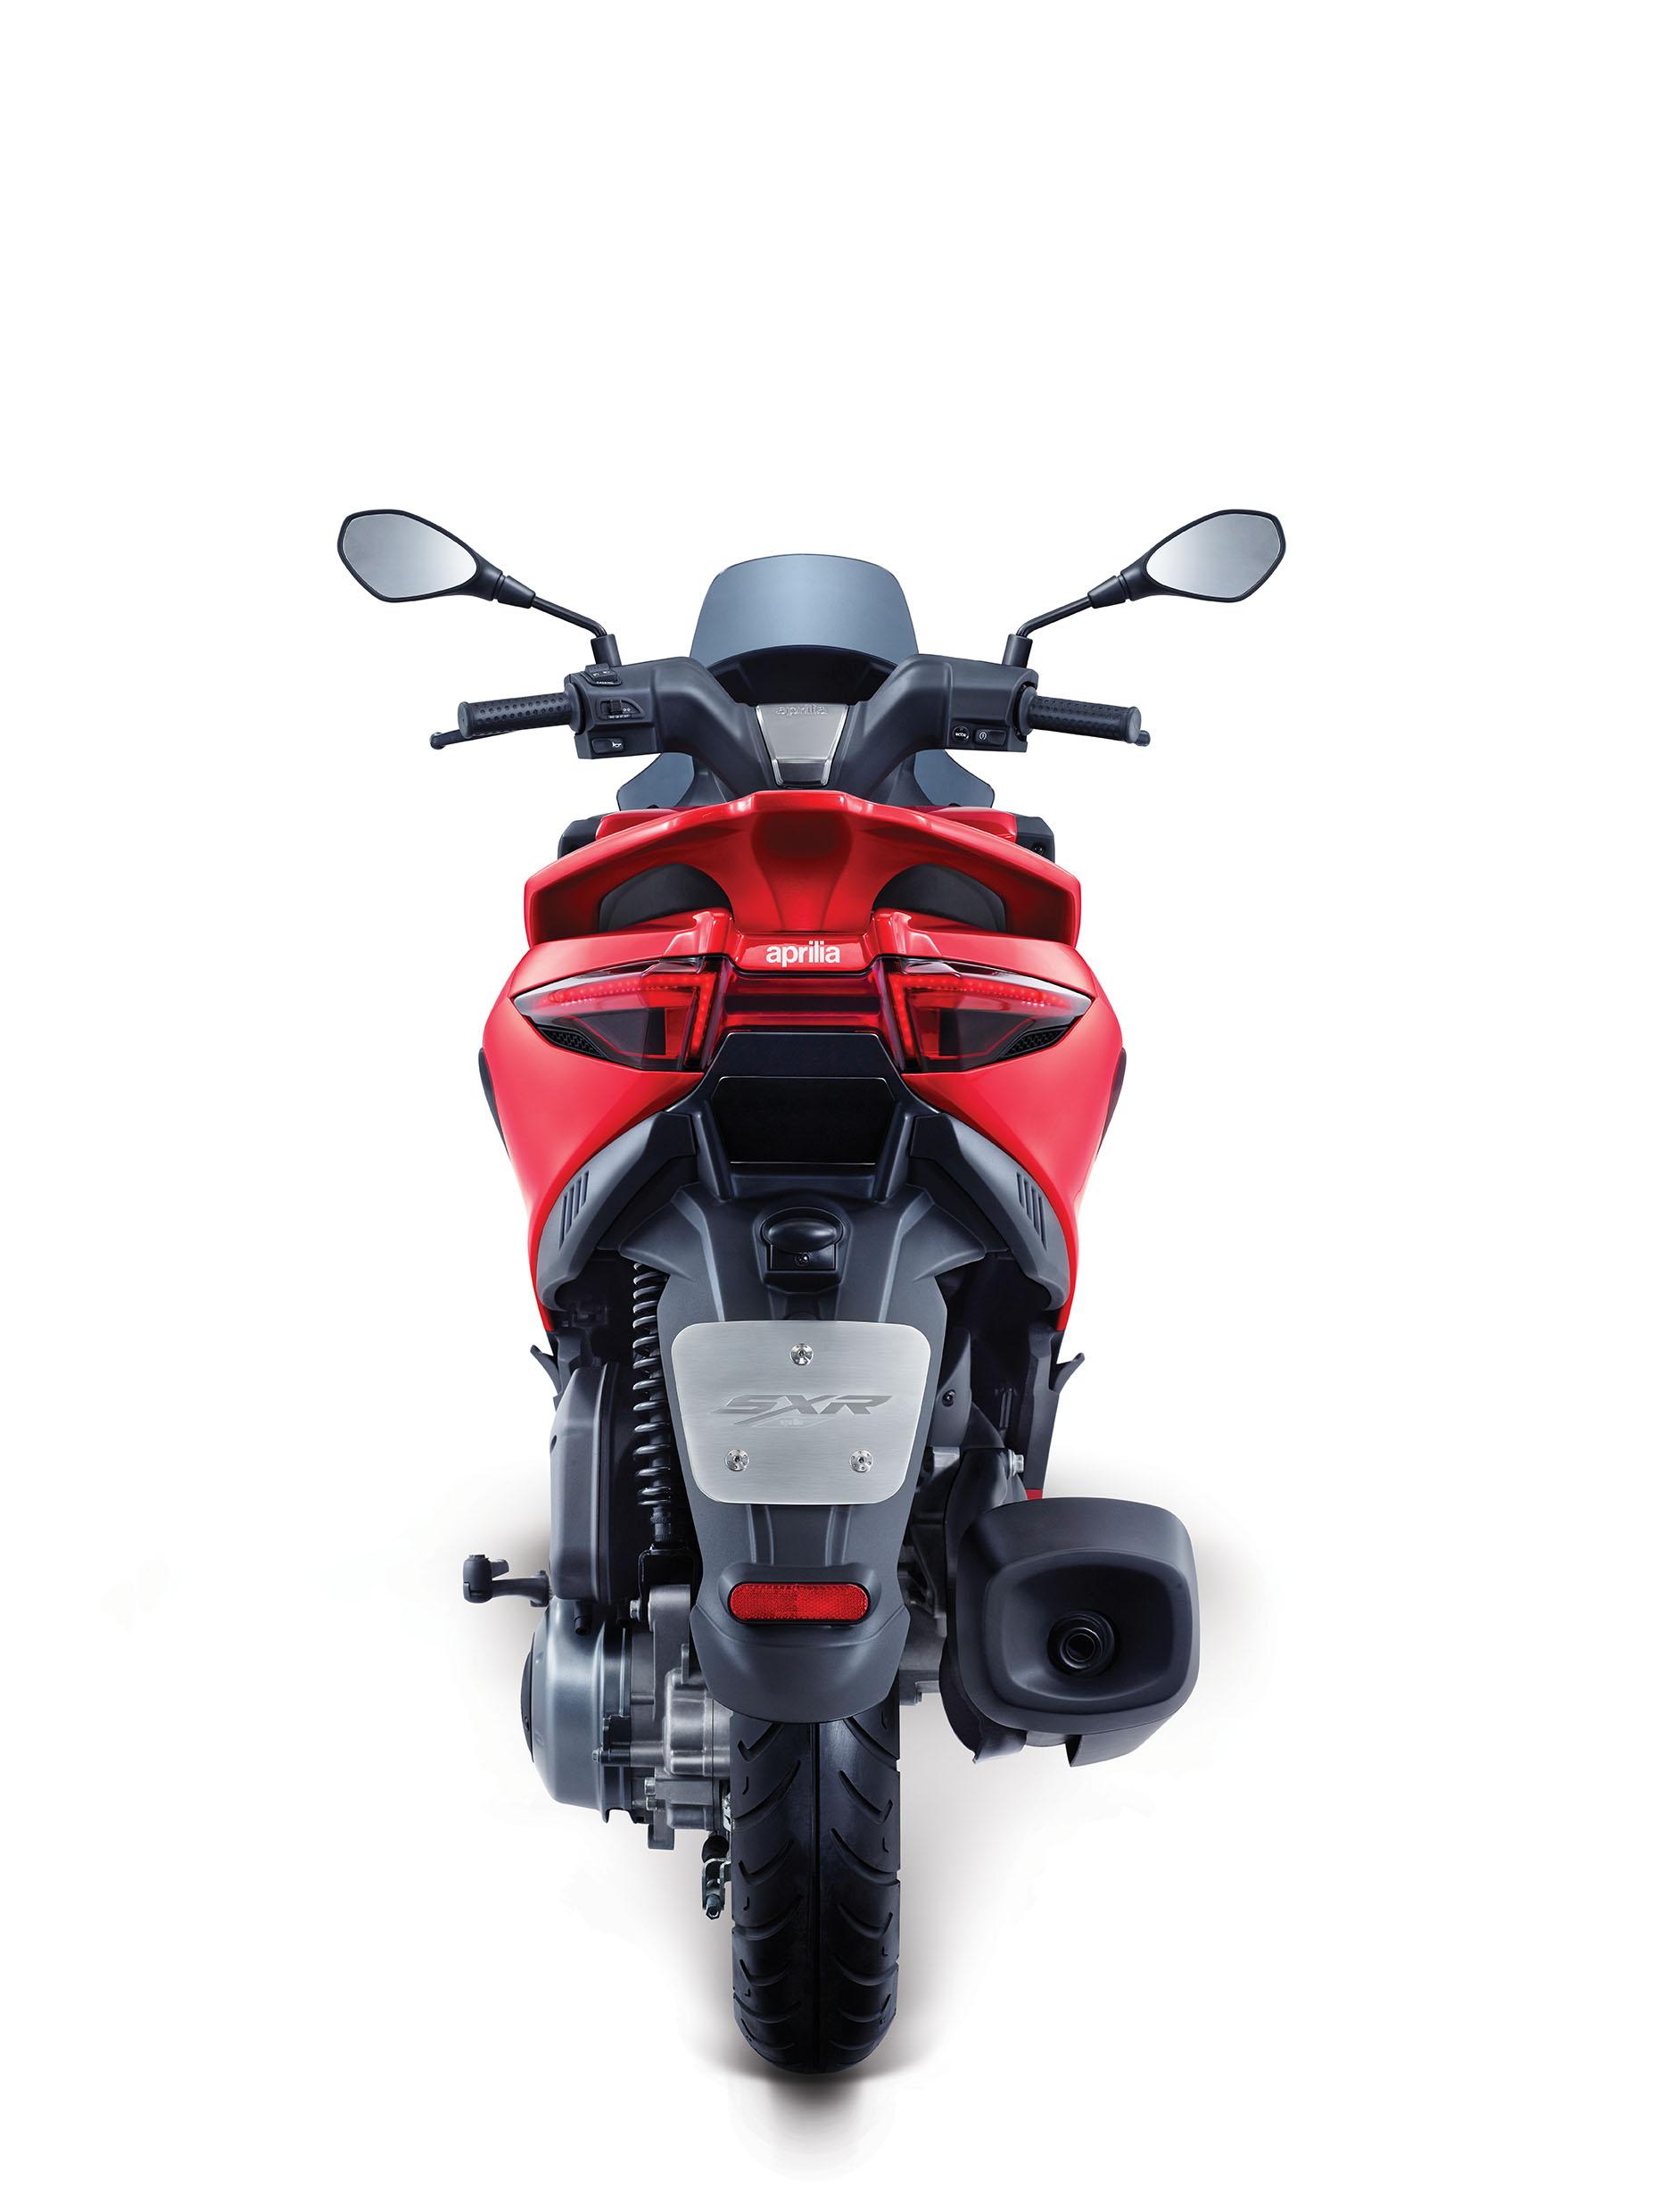 Piaggio India Unveils Aprilia Sxr 160